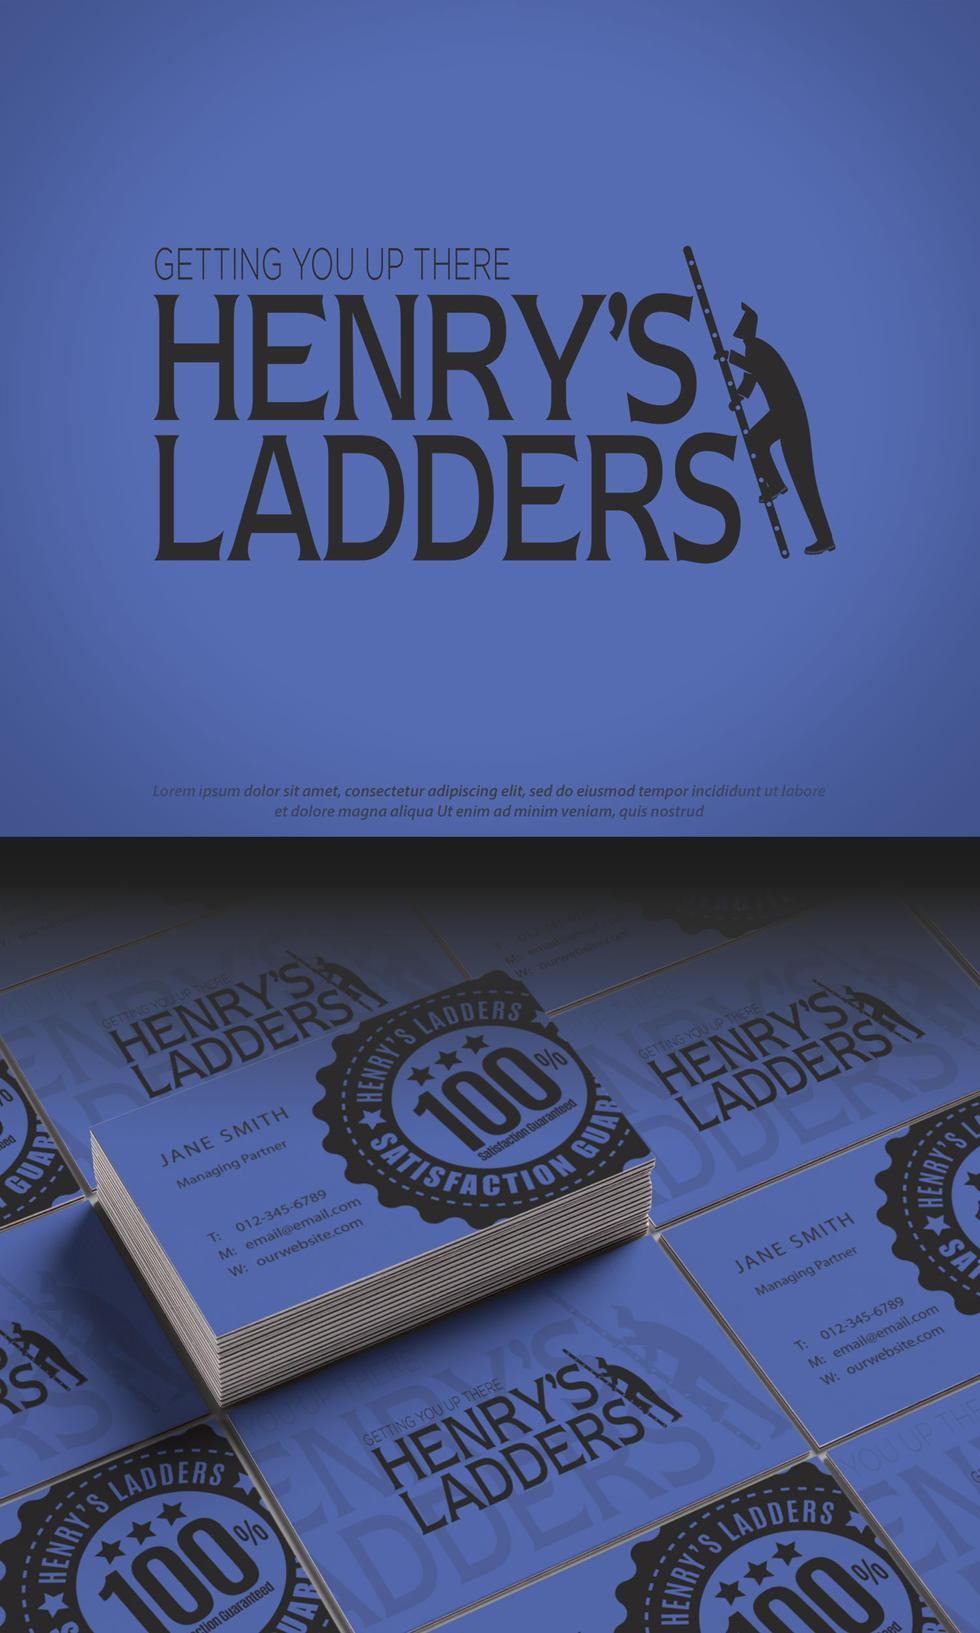 Henry's Ladders Business Cards Mock-Up 2